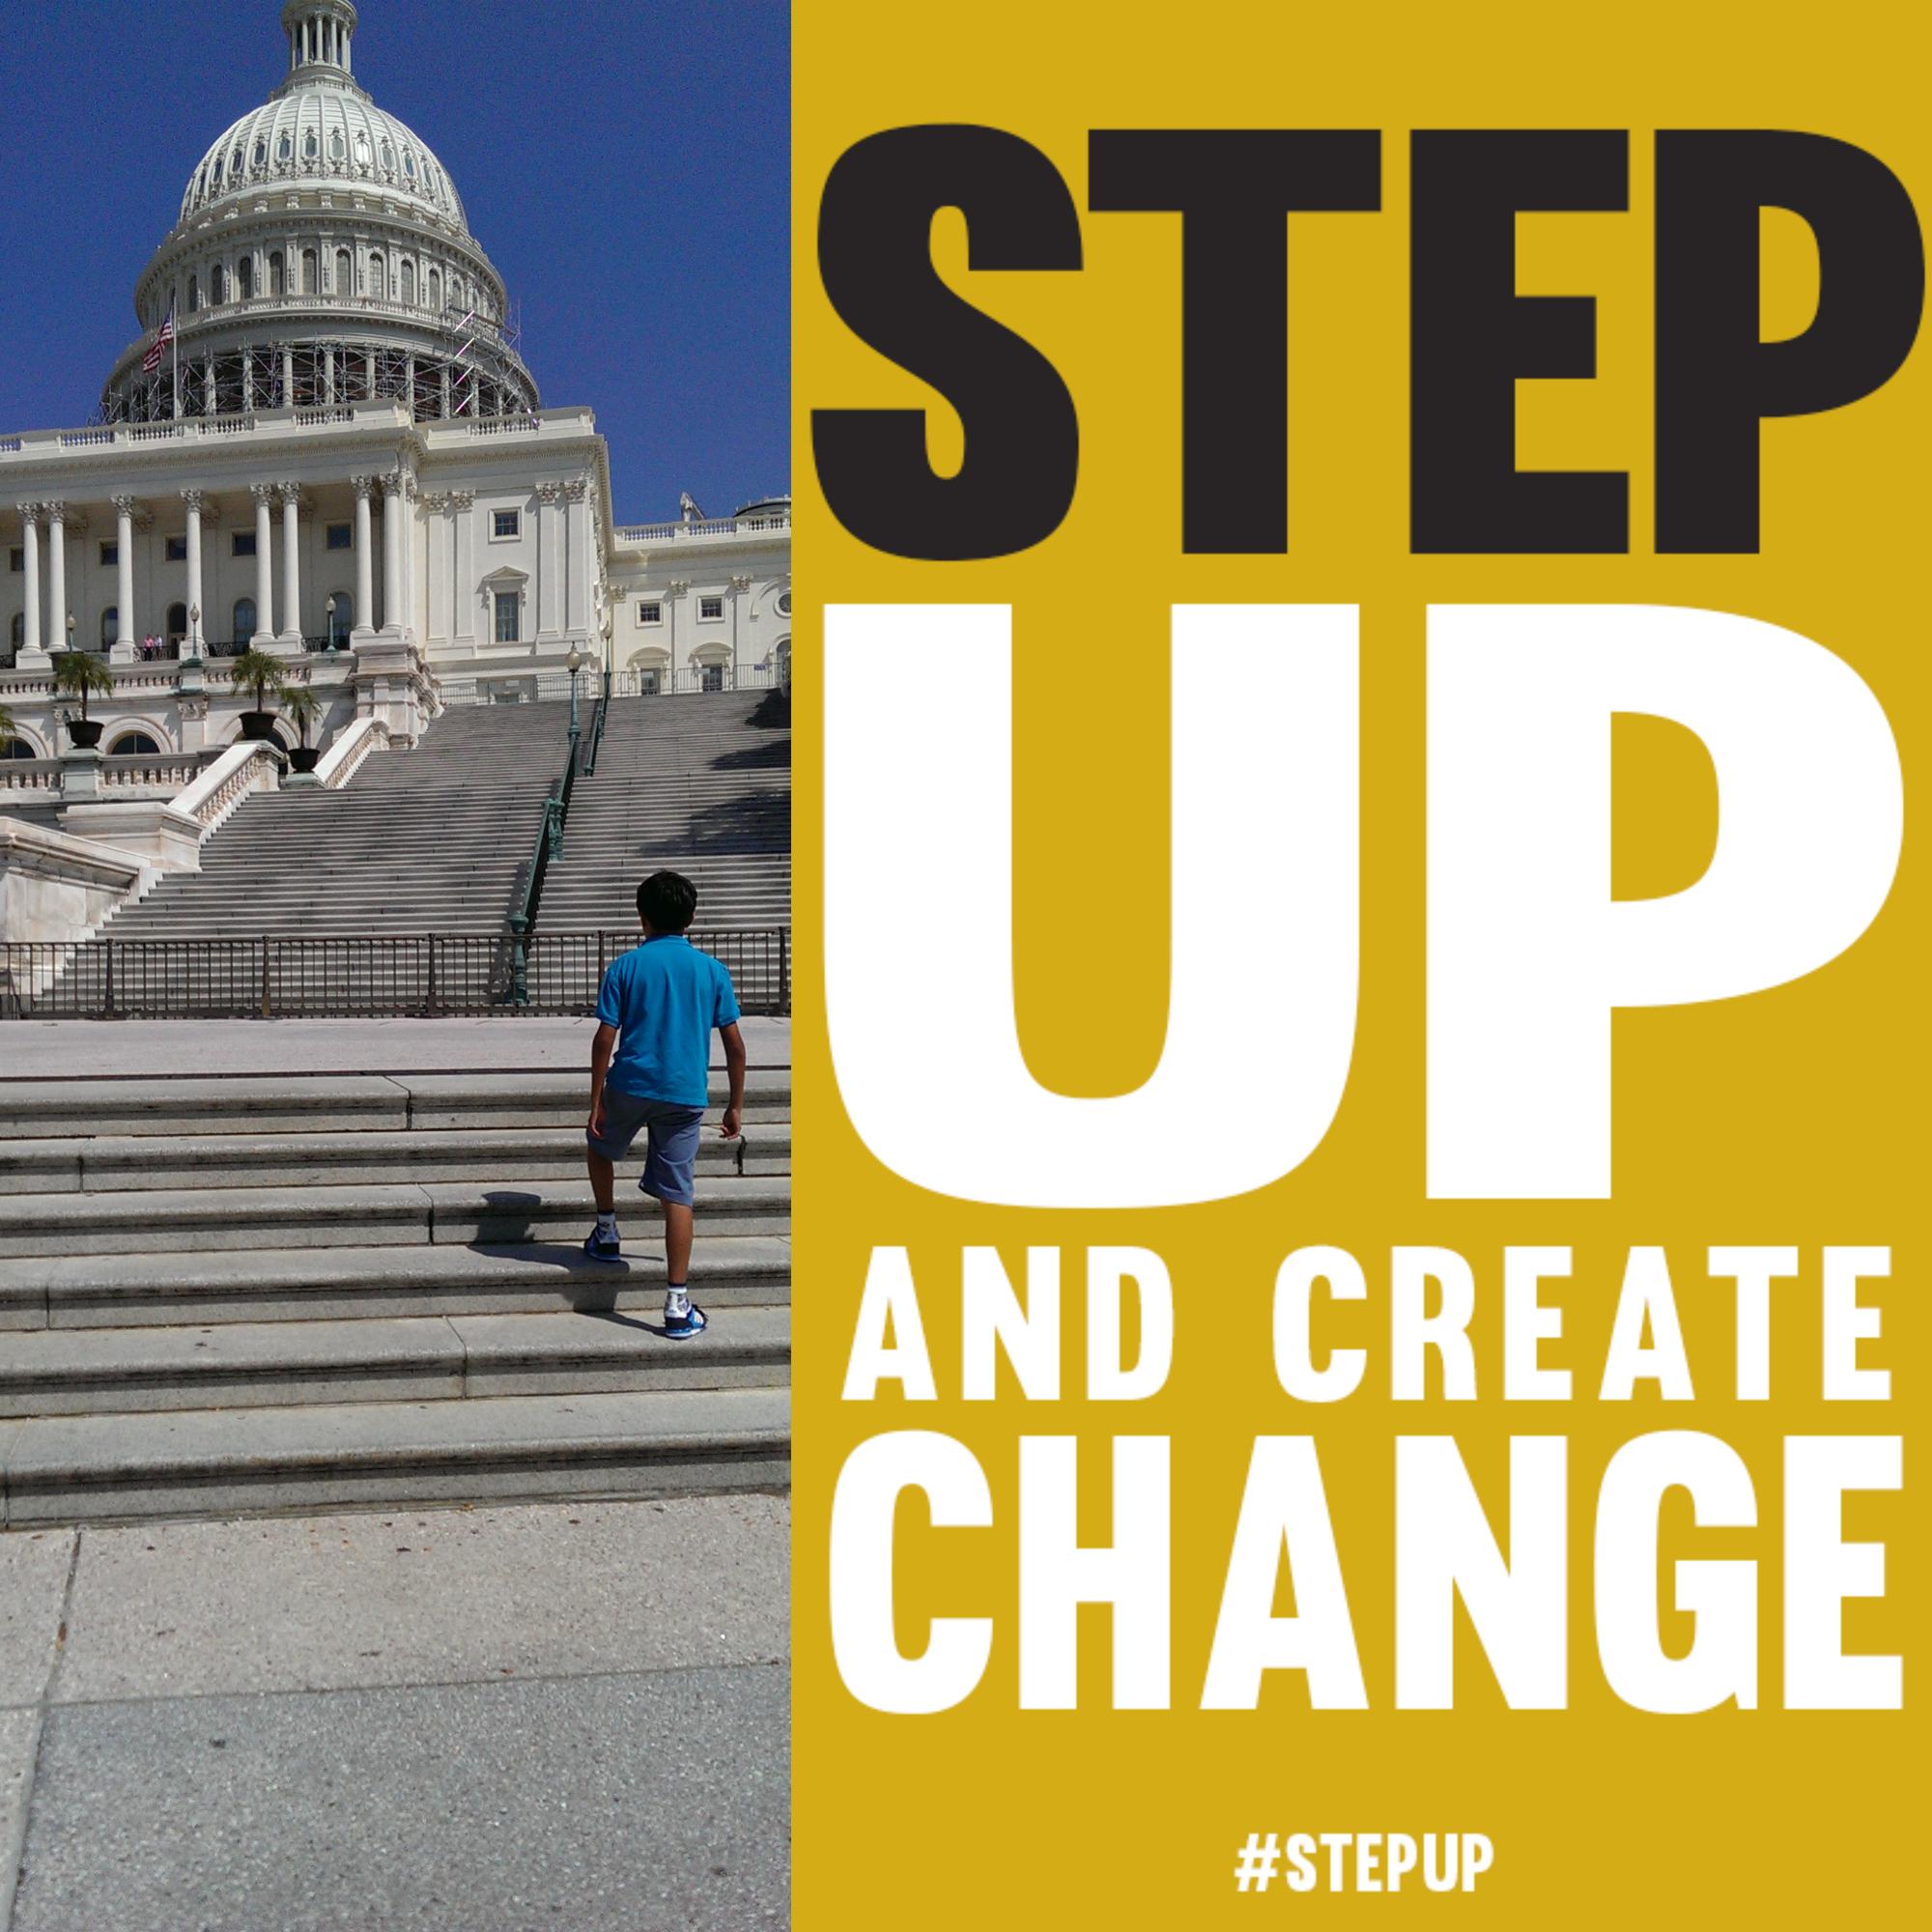 StepUp-Change-Capitol